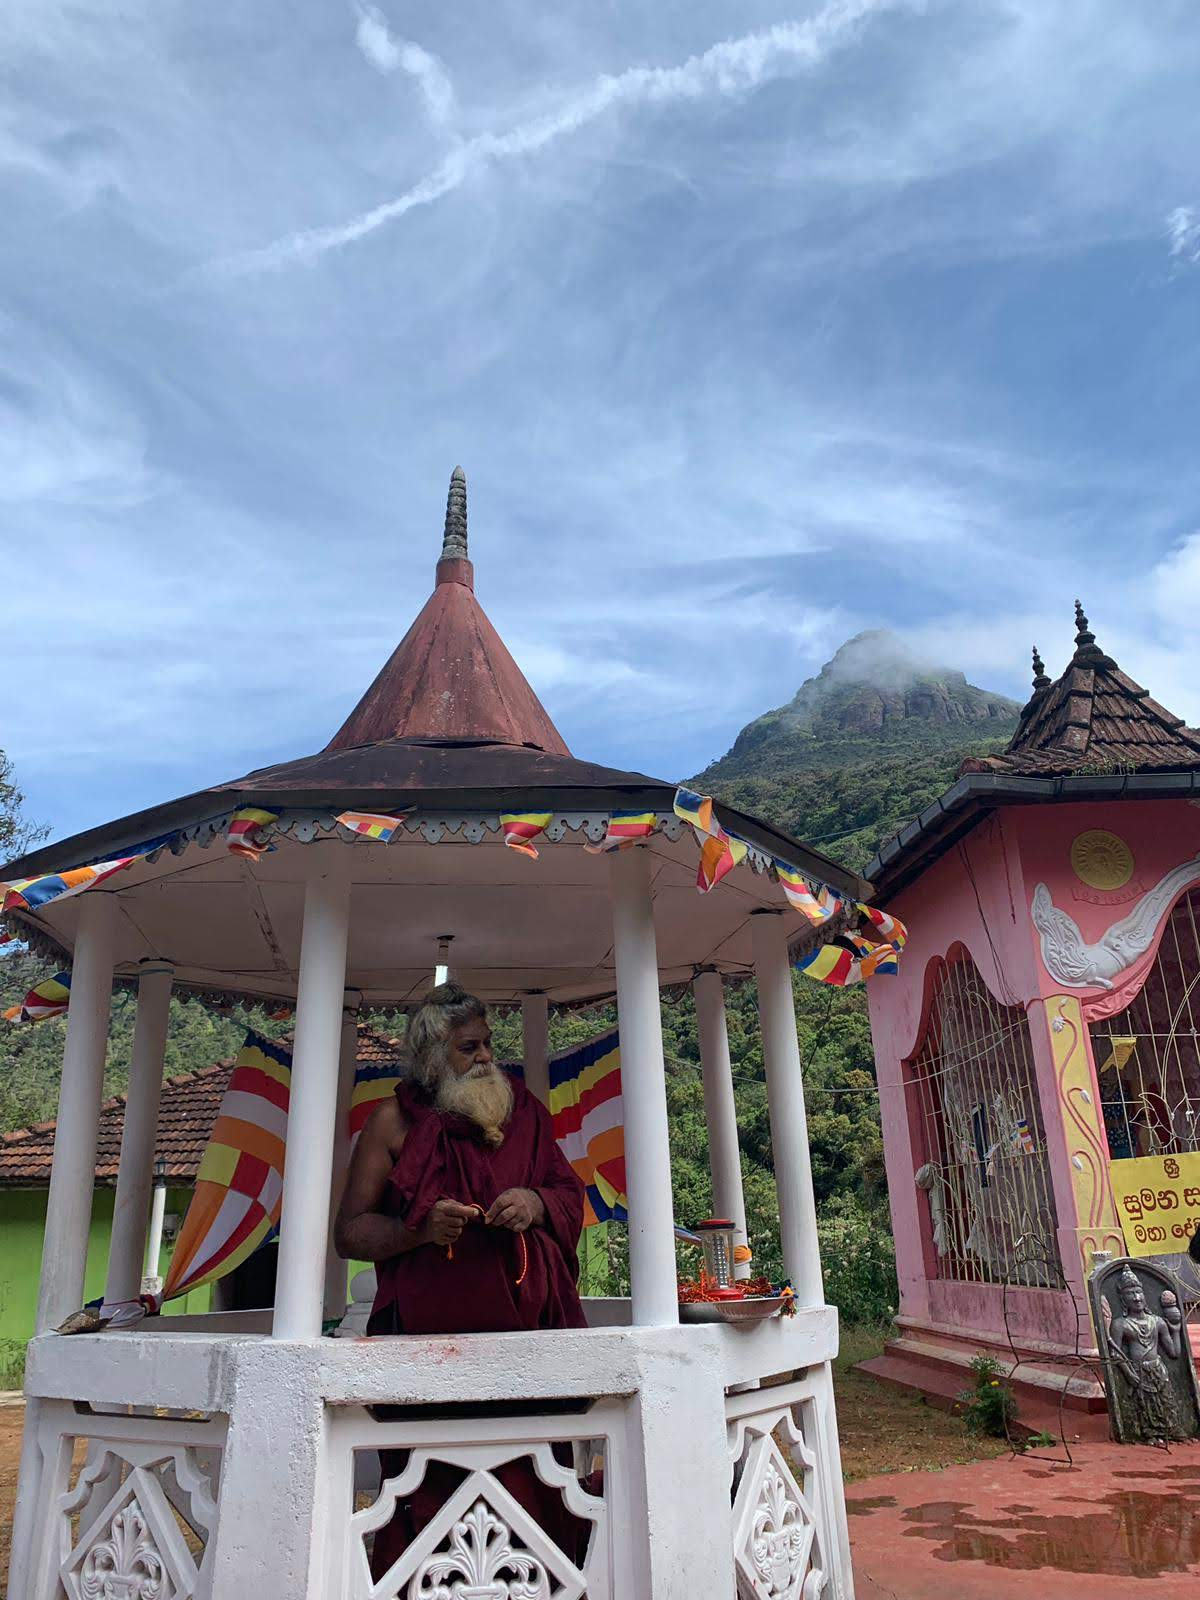 Offering a prayer to reach Sri Pada